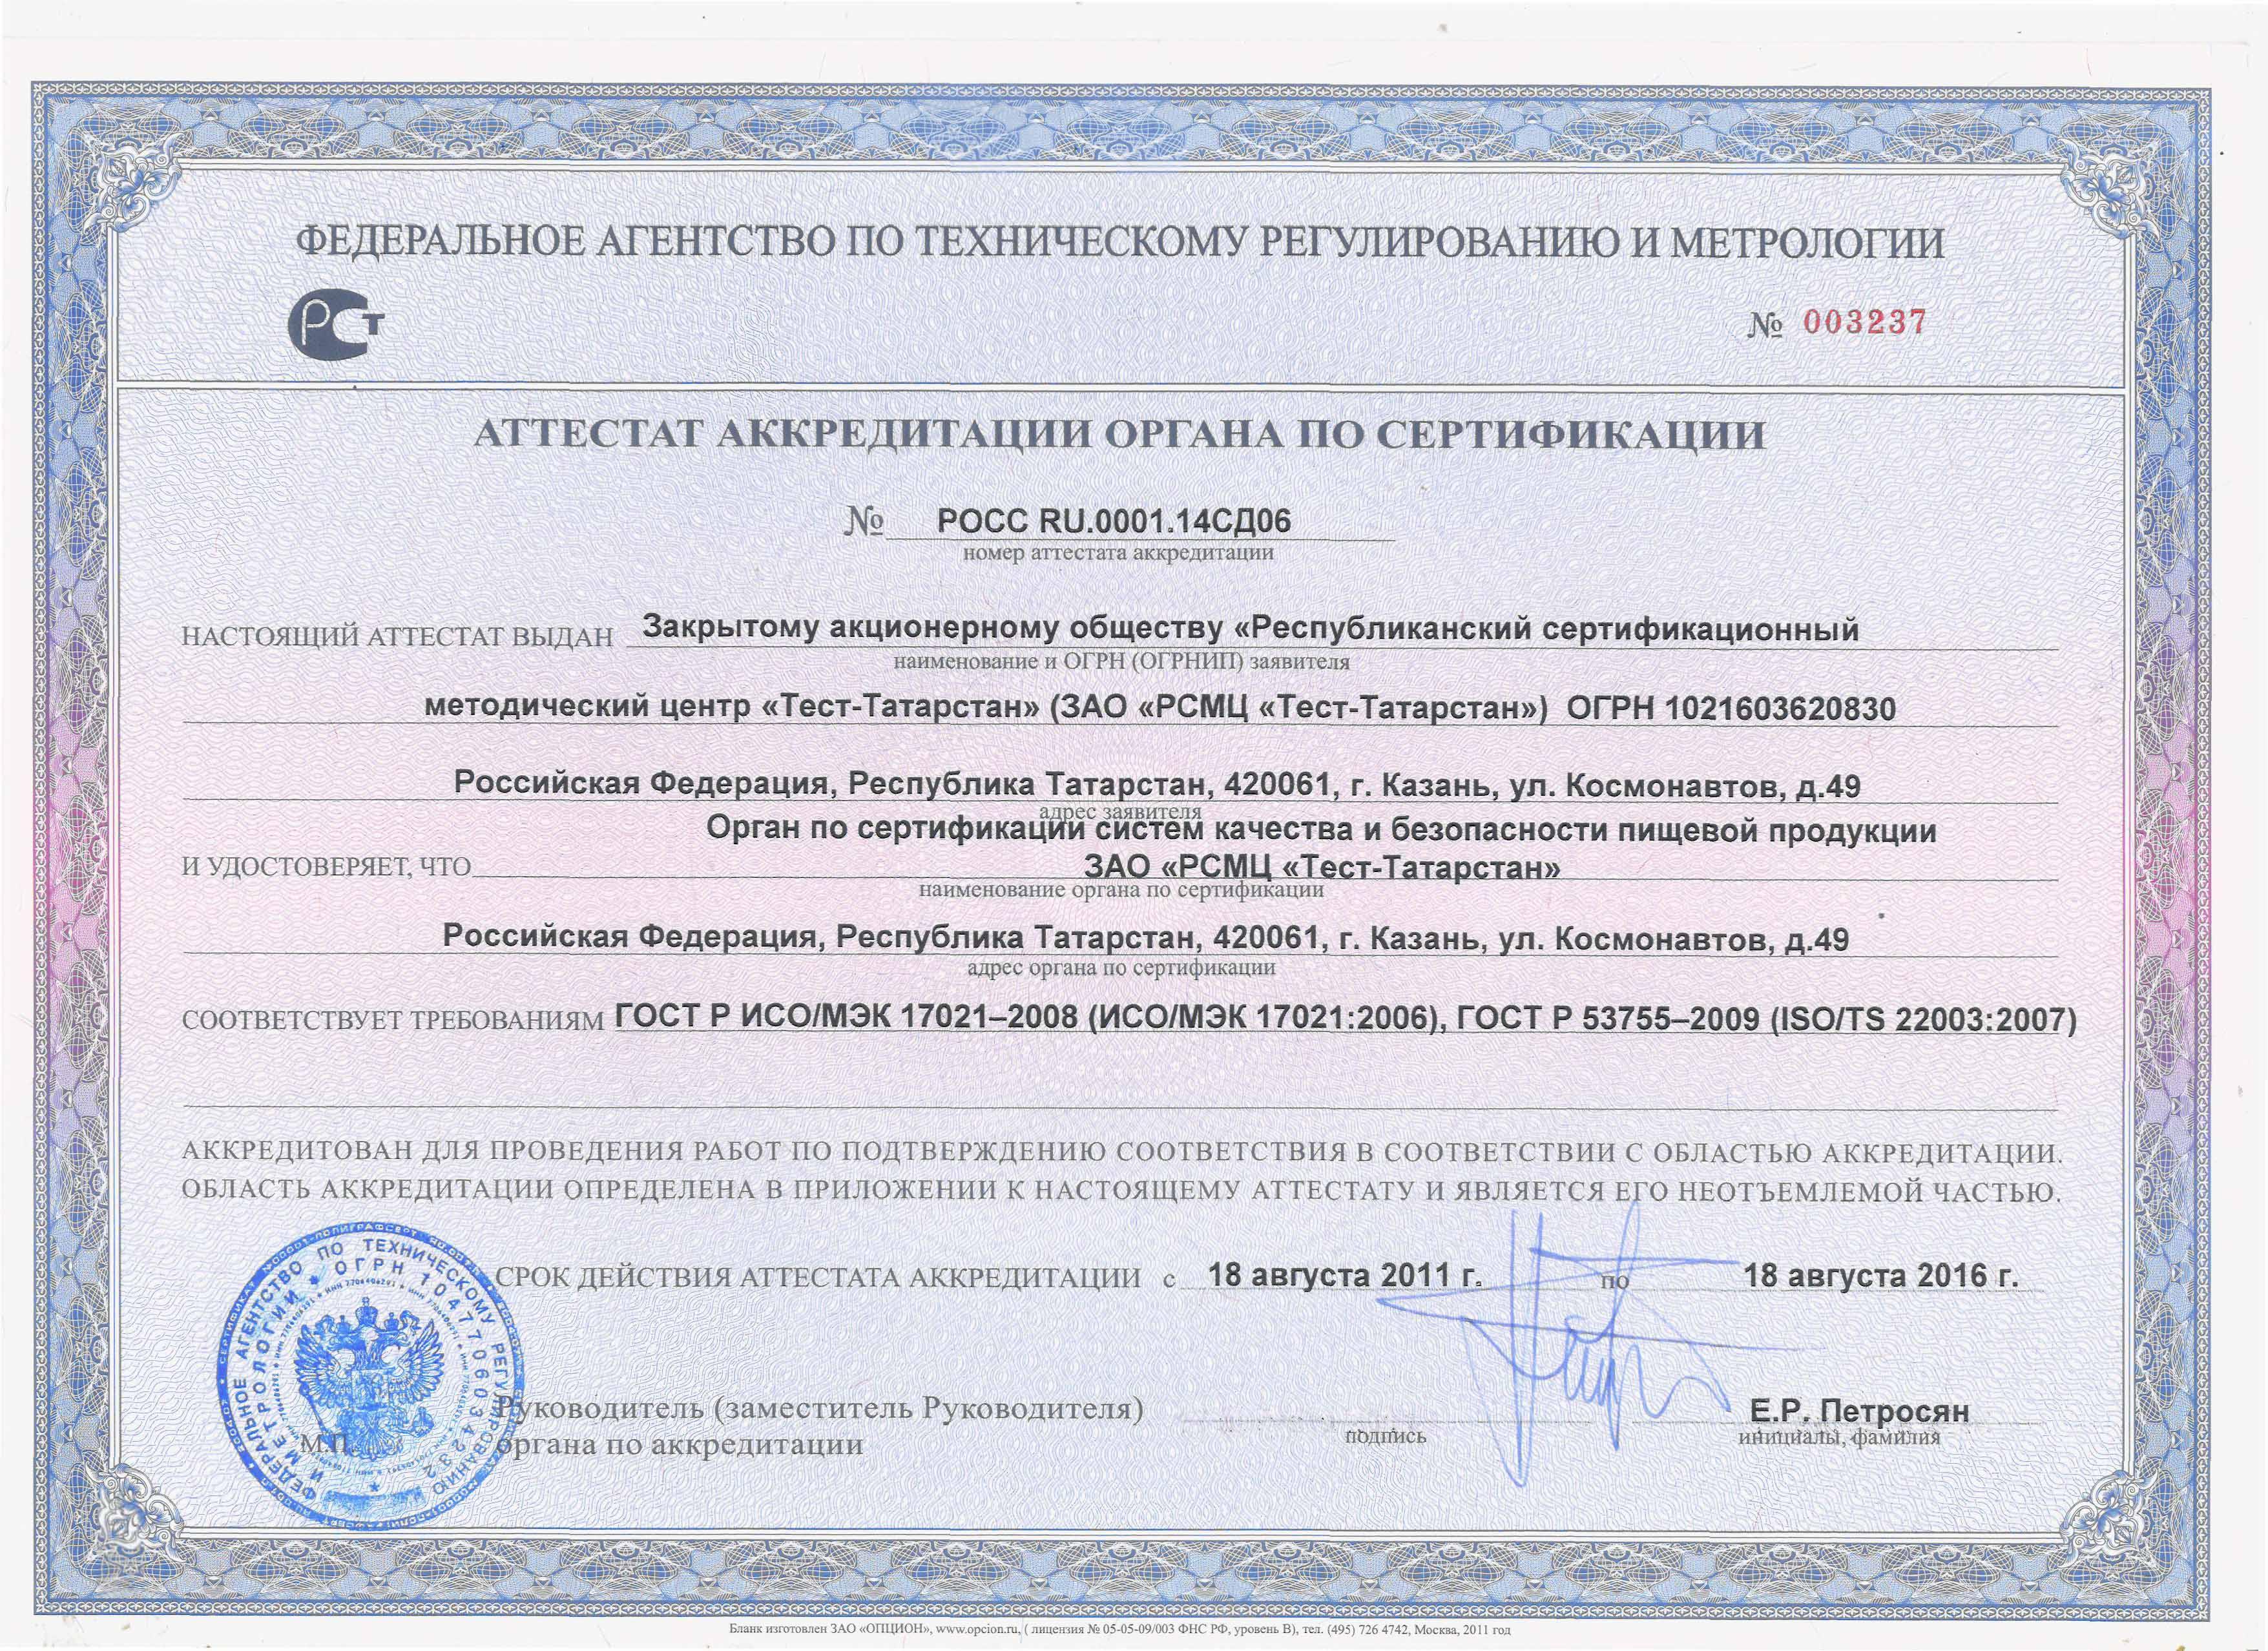 Сертификация по системе haccp сертификация giac gsec